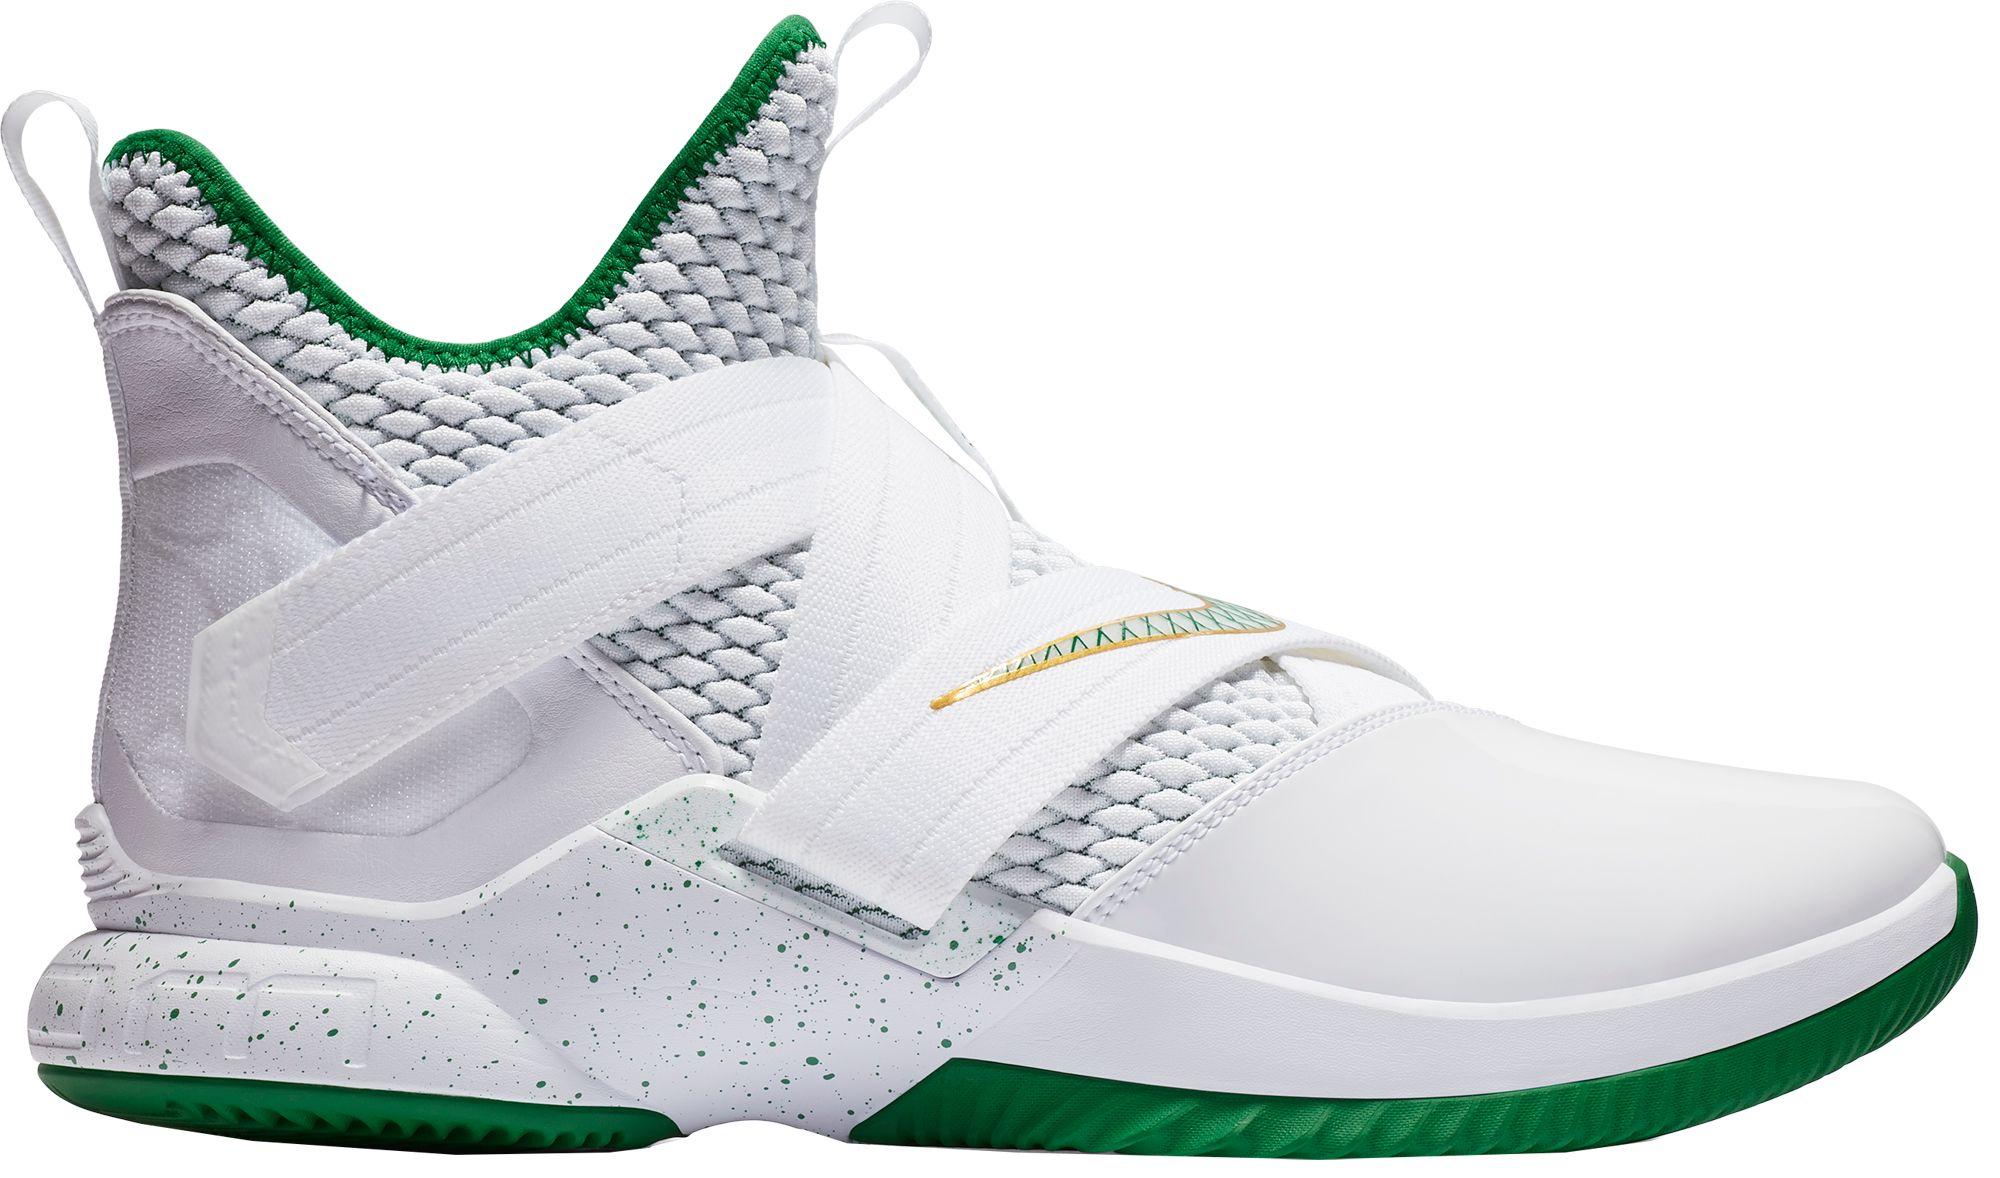 8ed16f0a65a24 nike mens lebron 15 basketball shoes dicks sporting goods - HD 1314×1116